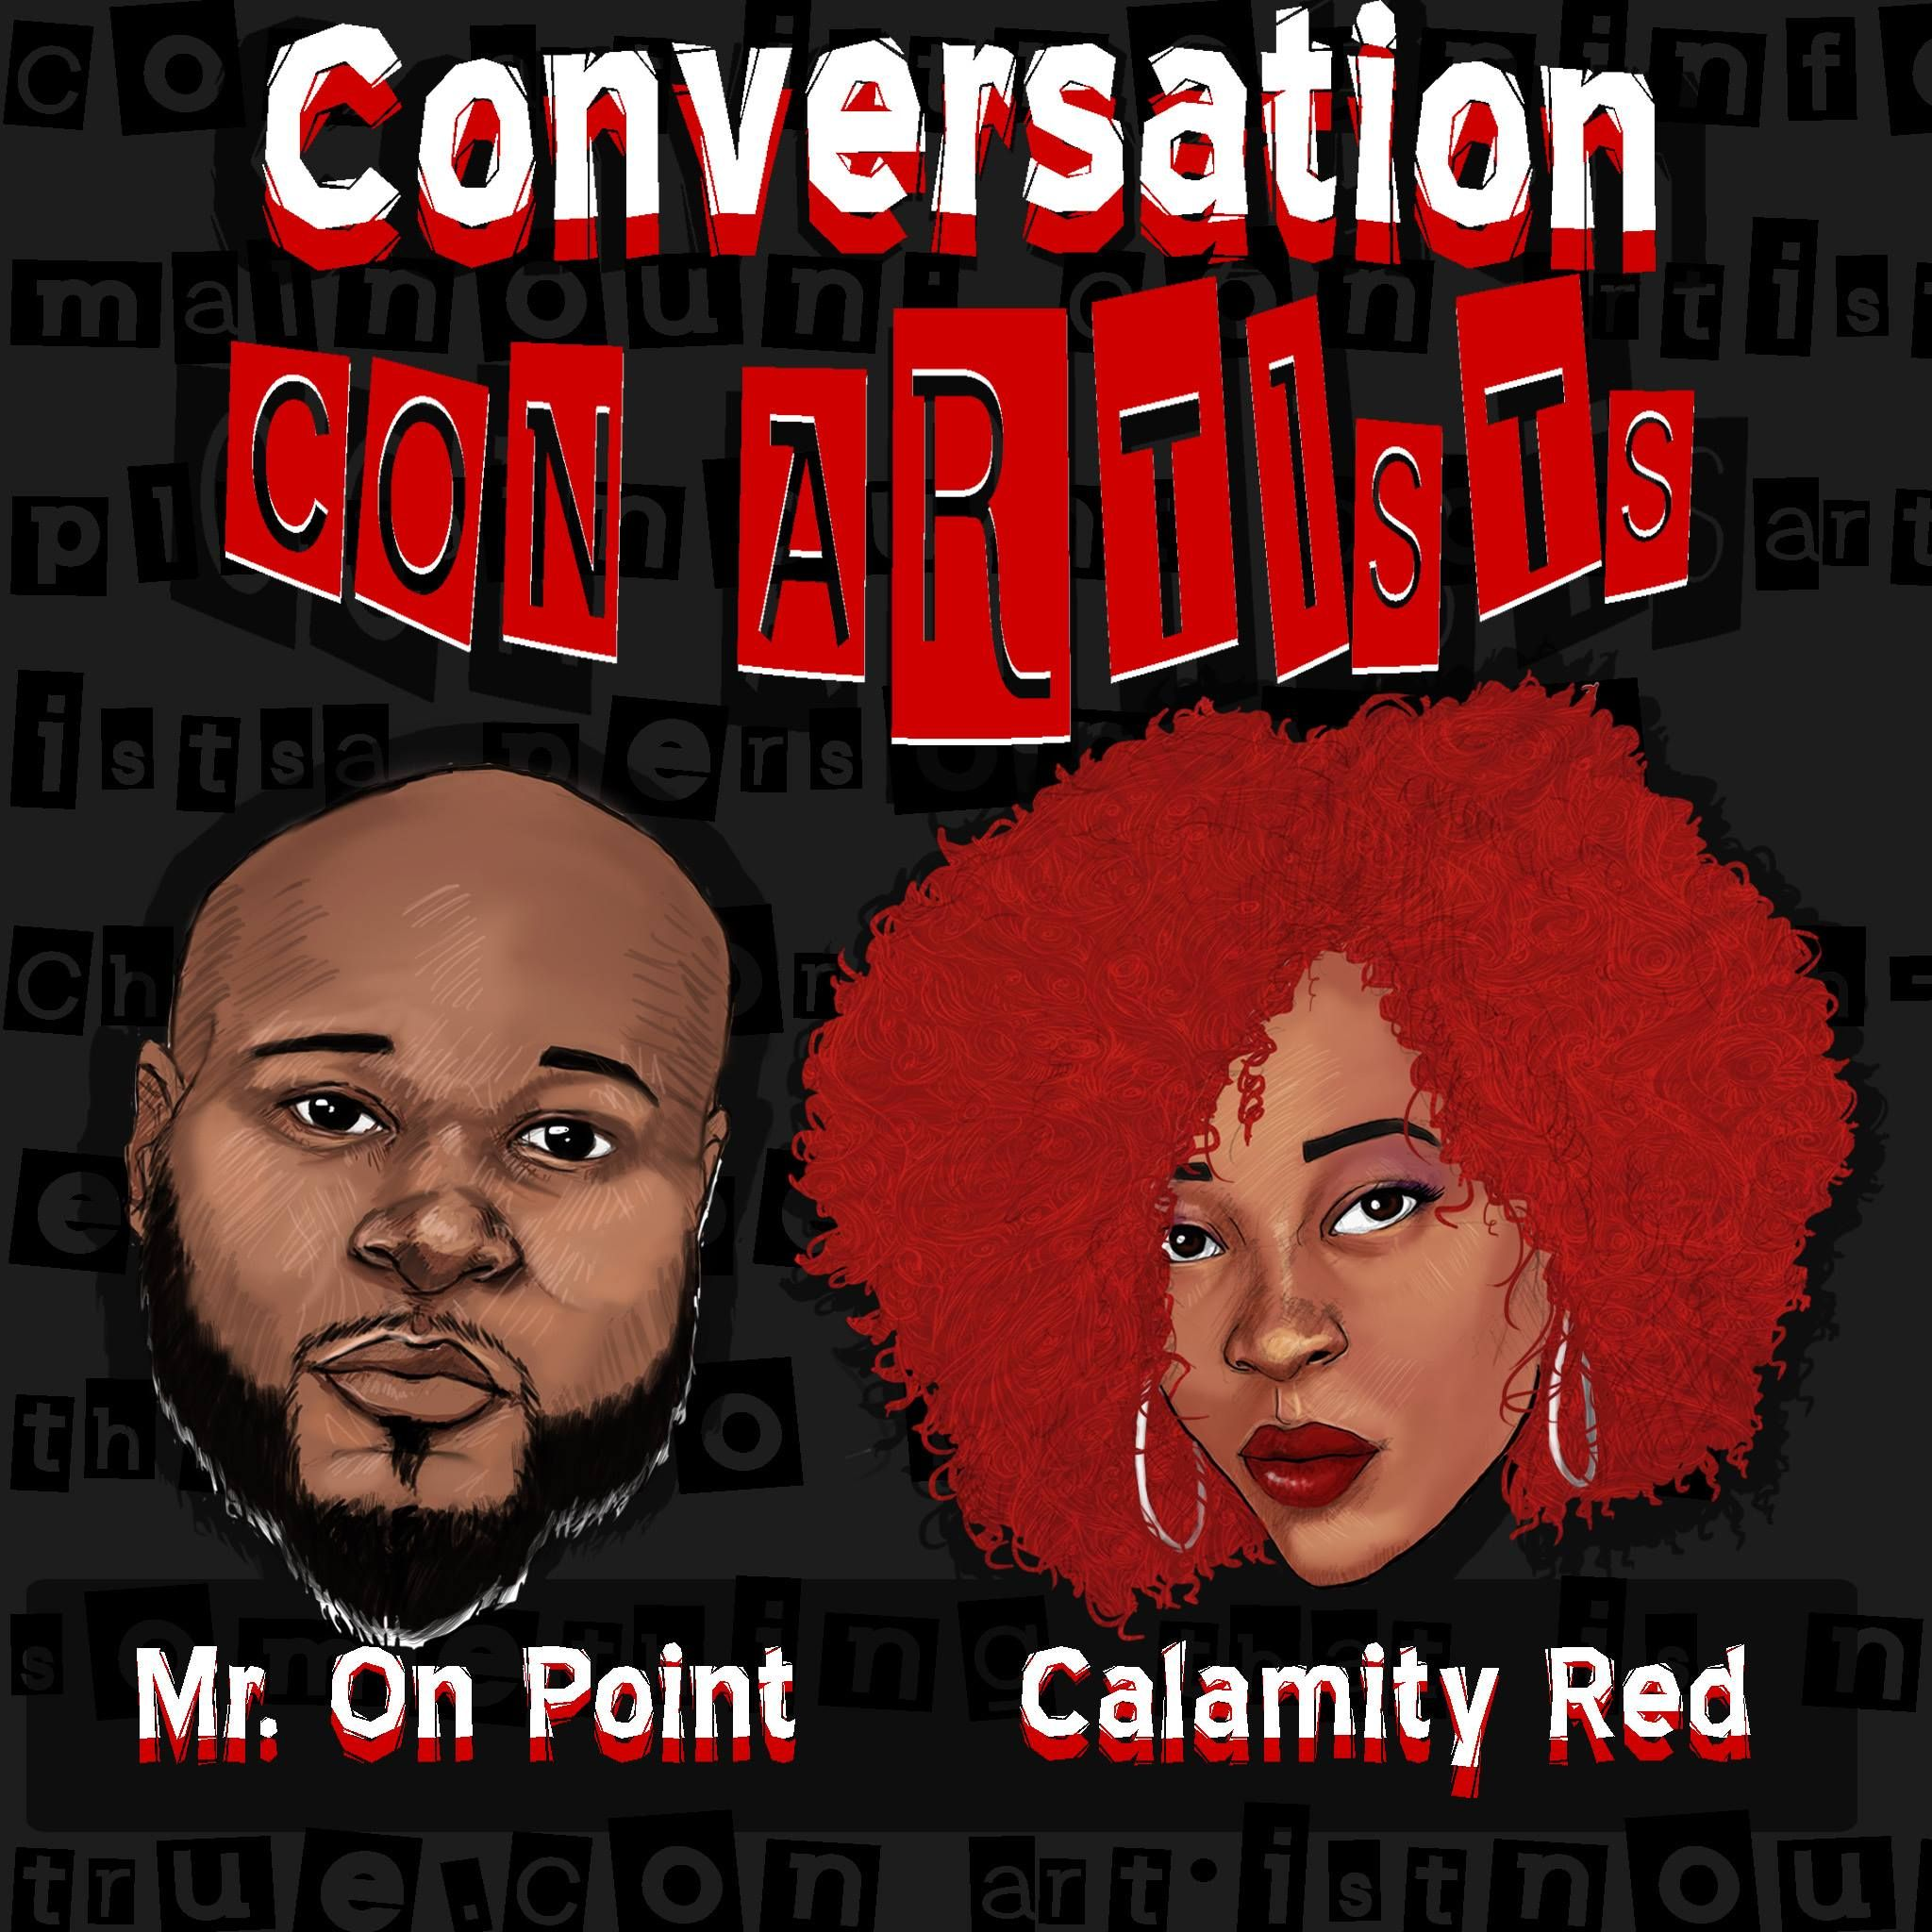 Conversation Con Artists